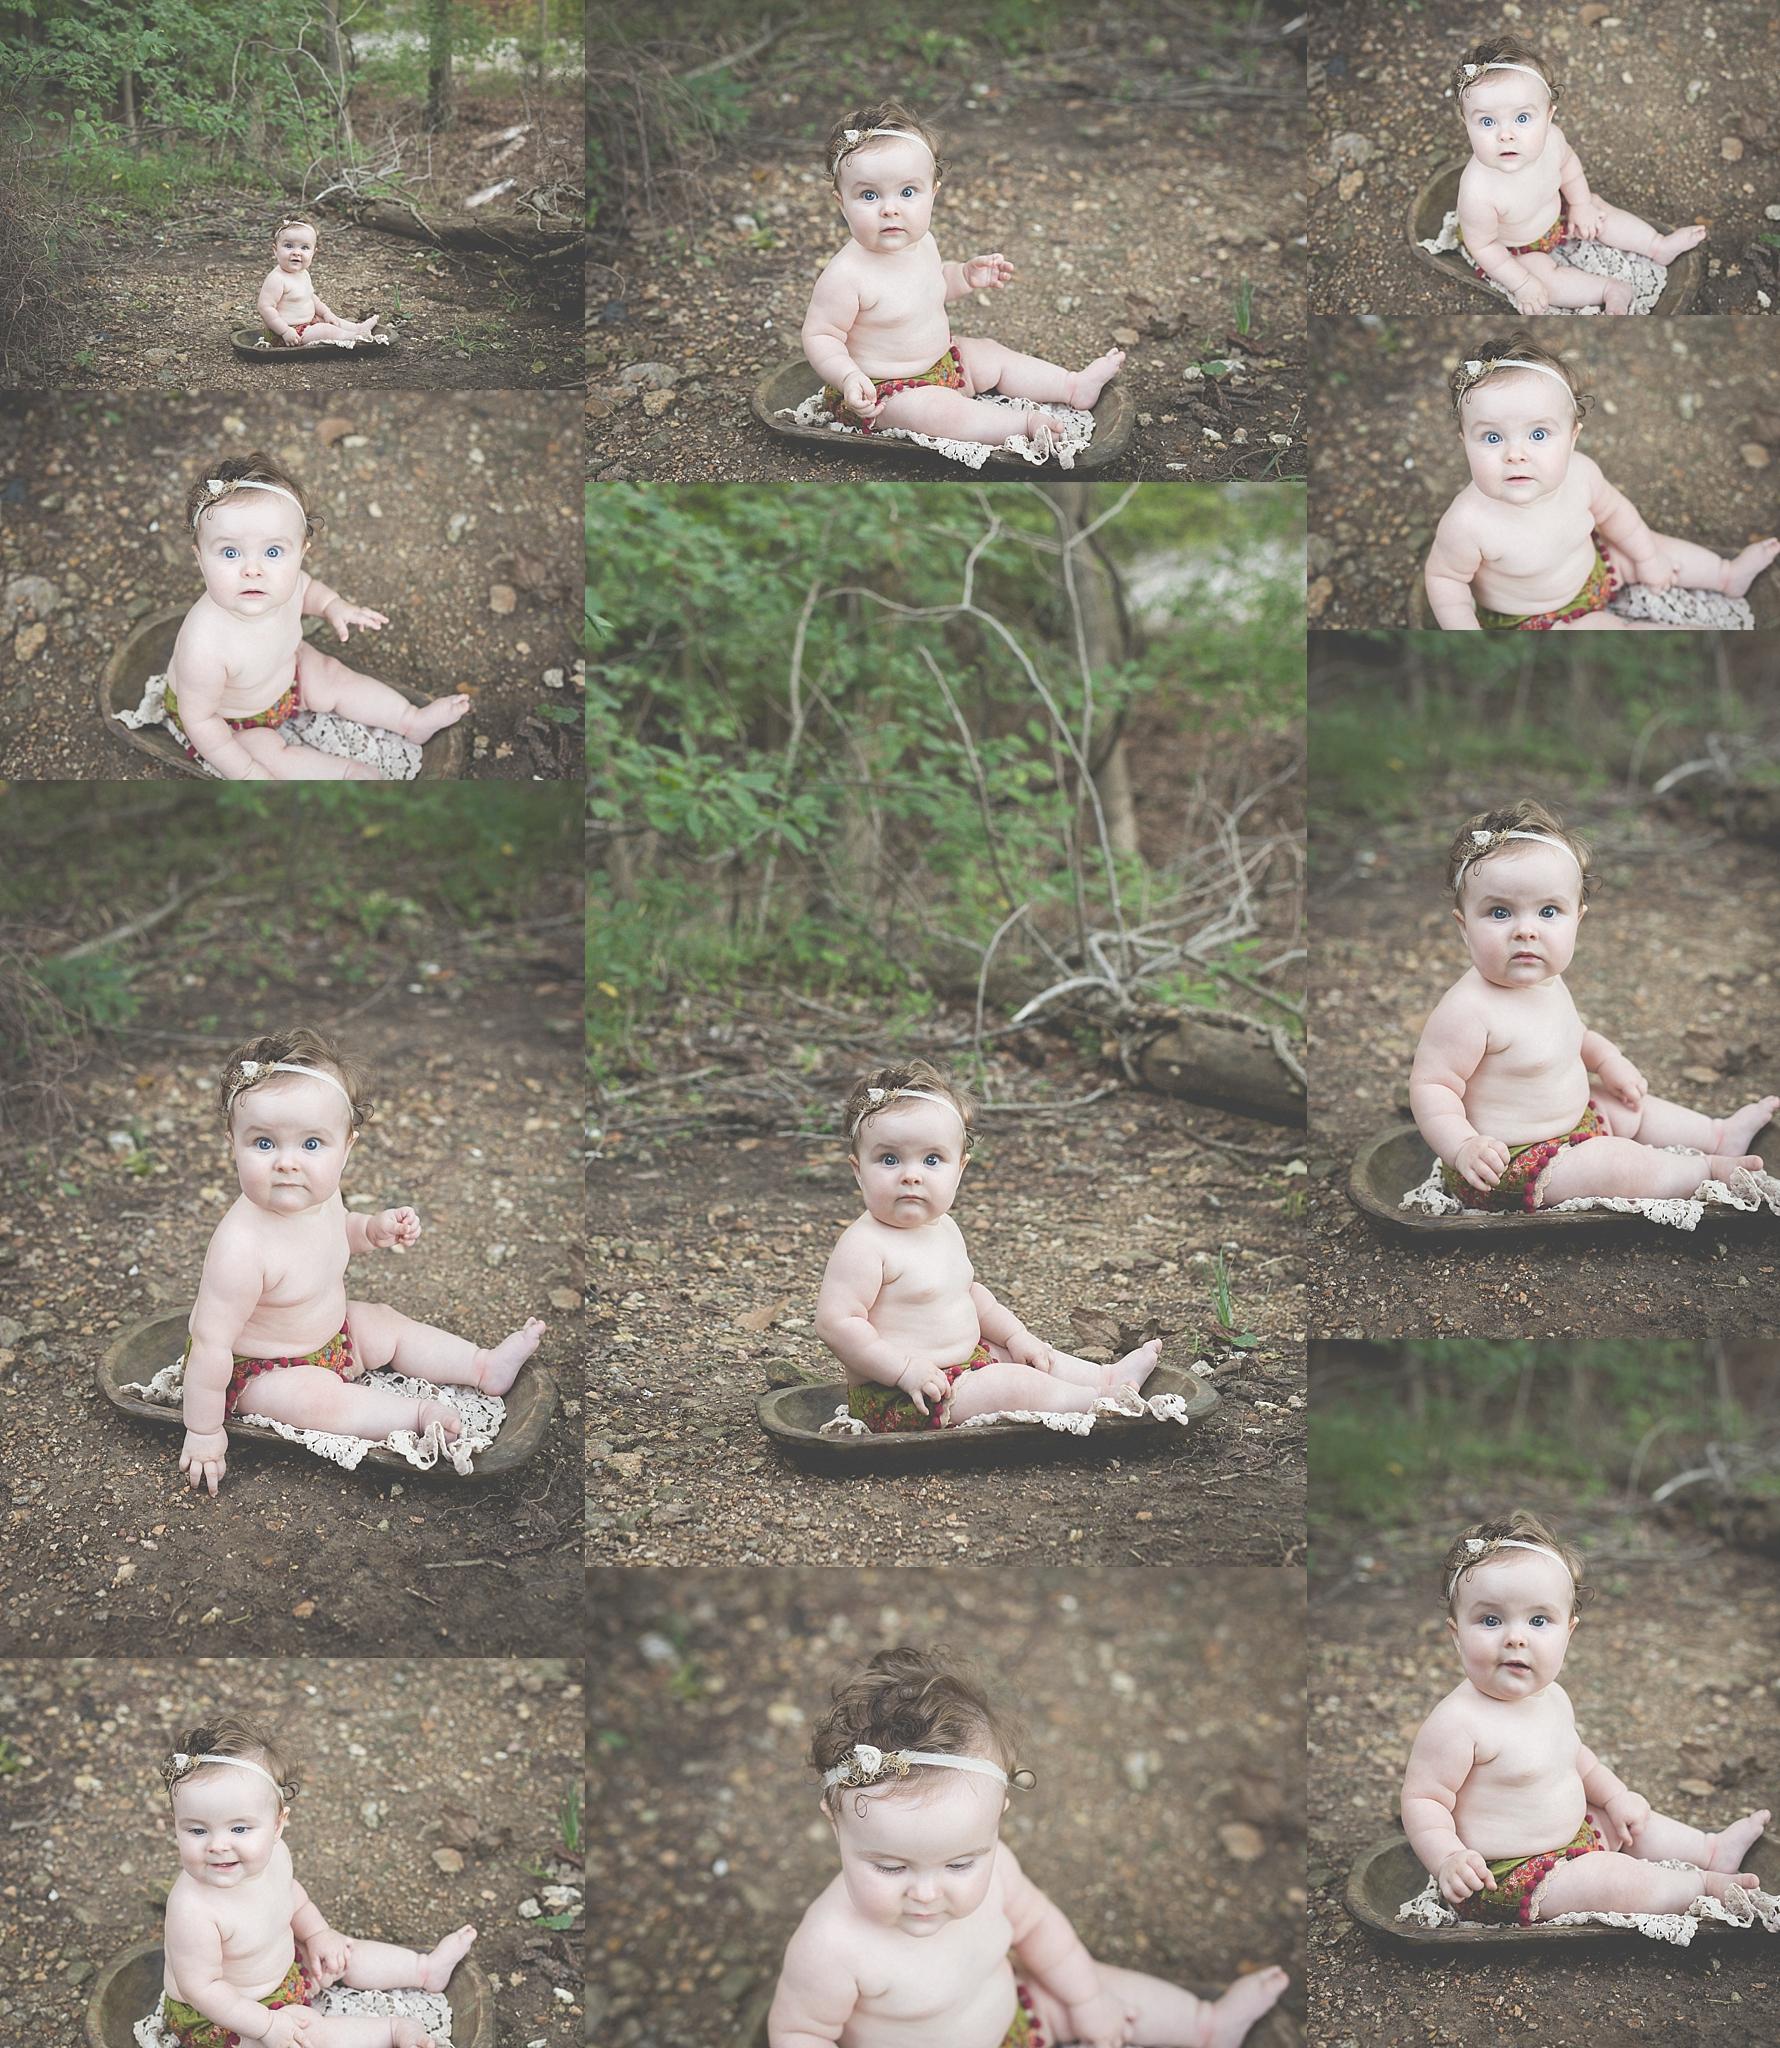 08-23-17lake ozarks missouri family baby outdoor photography mini session4.jpg